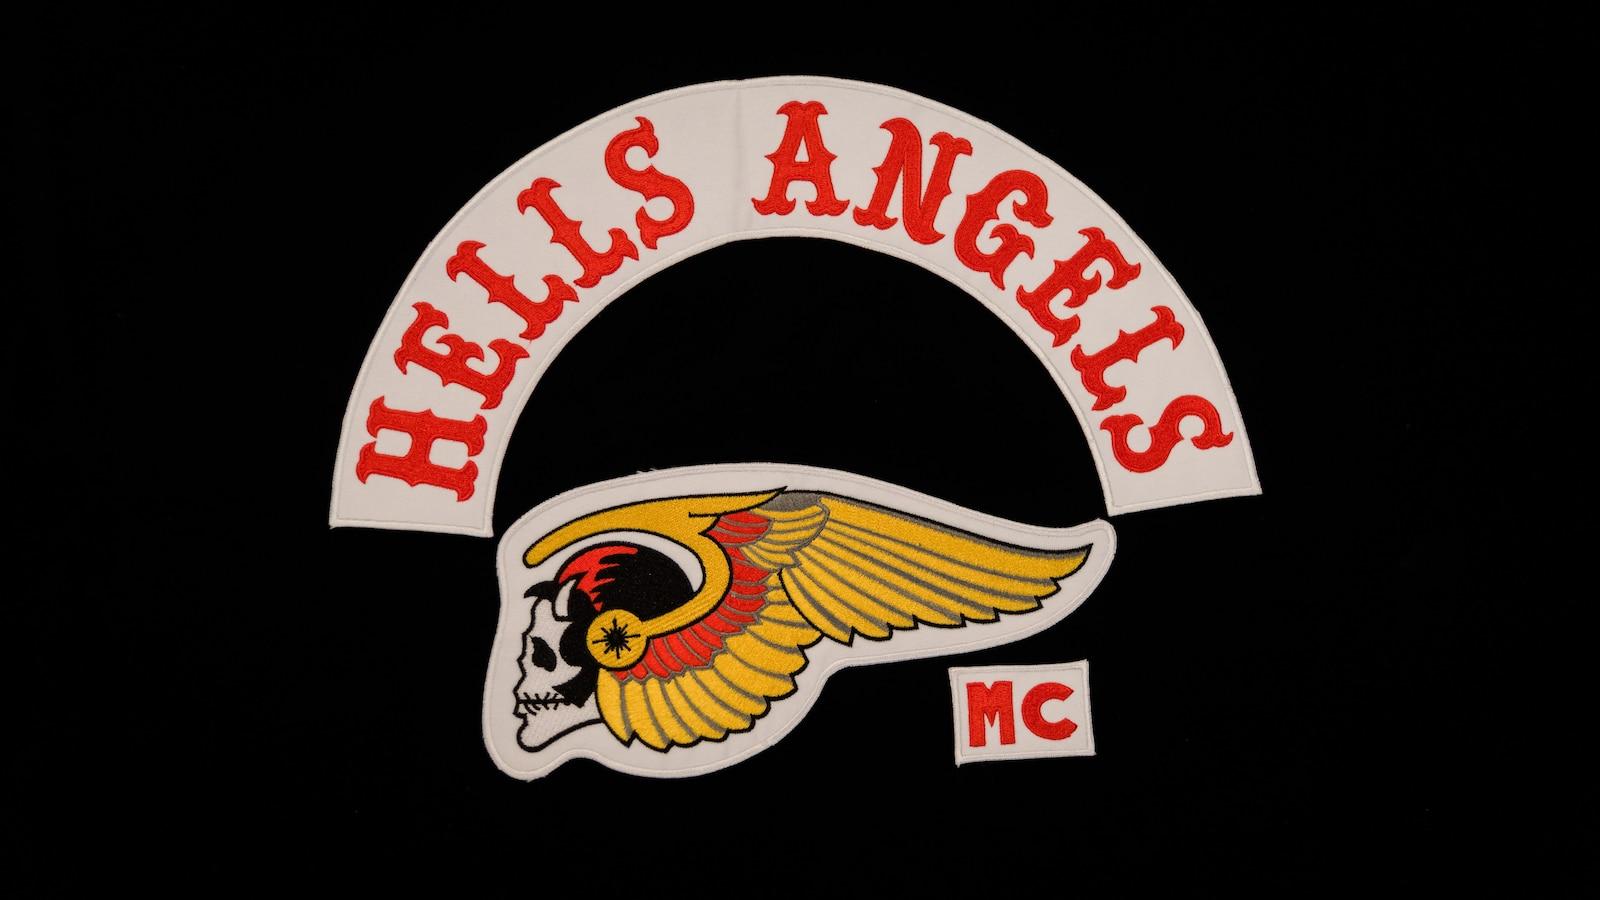 Fausses Vestes Des Hells Angels Un Jeu Dangereux Ici Radio